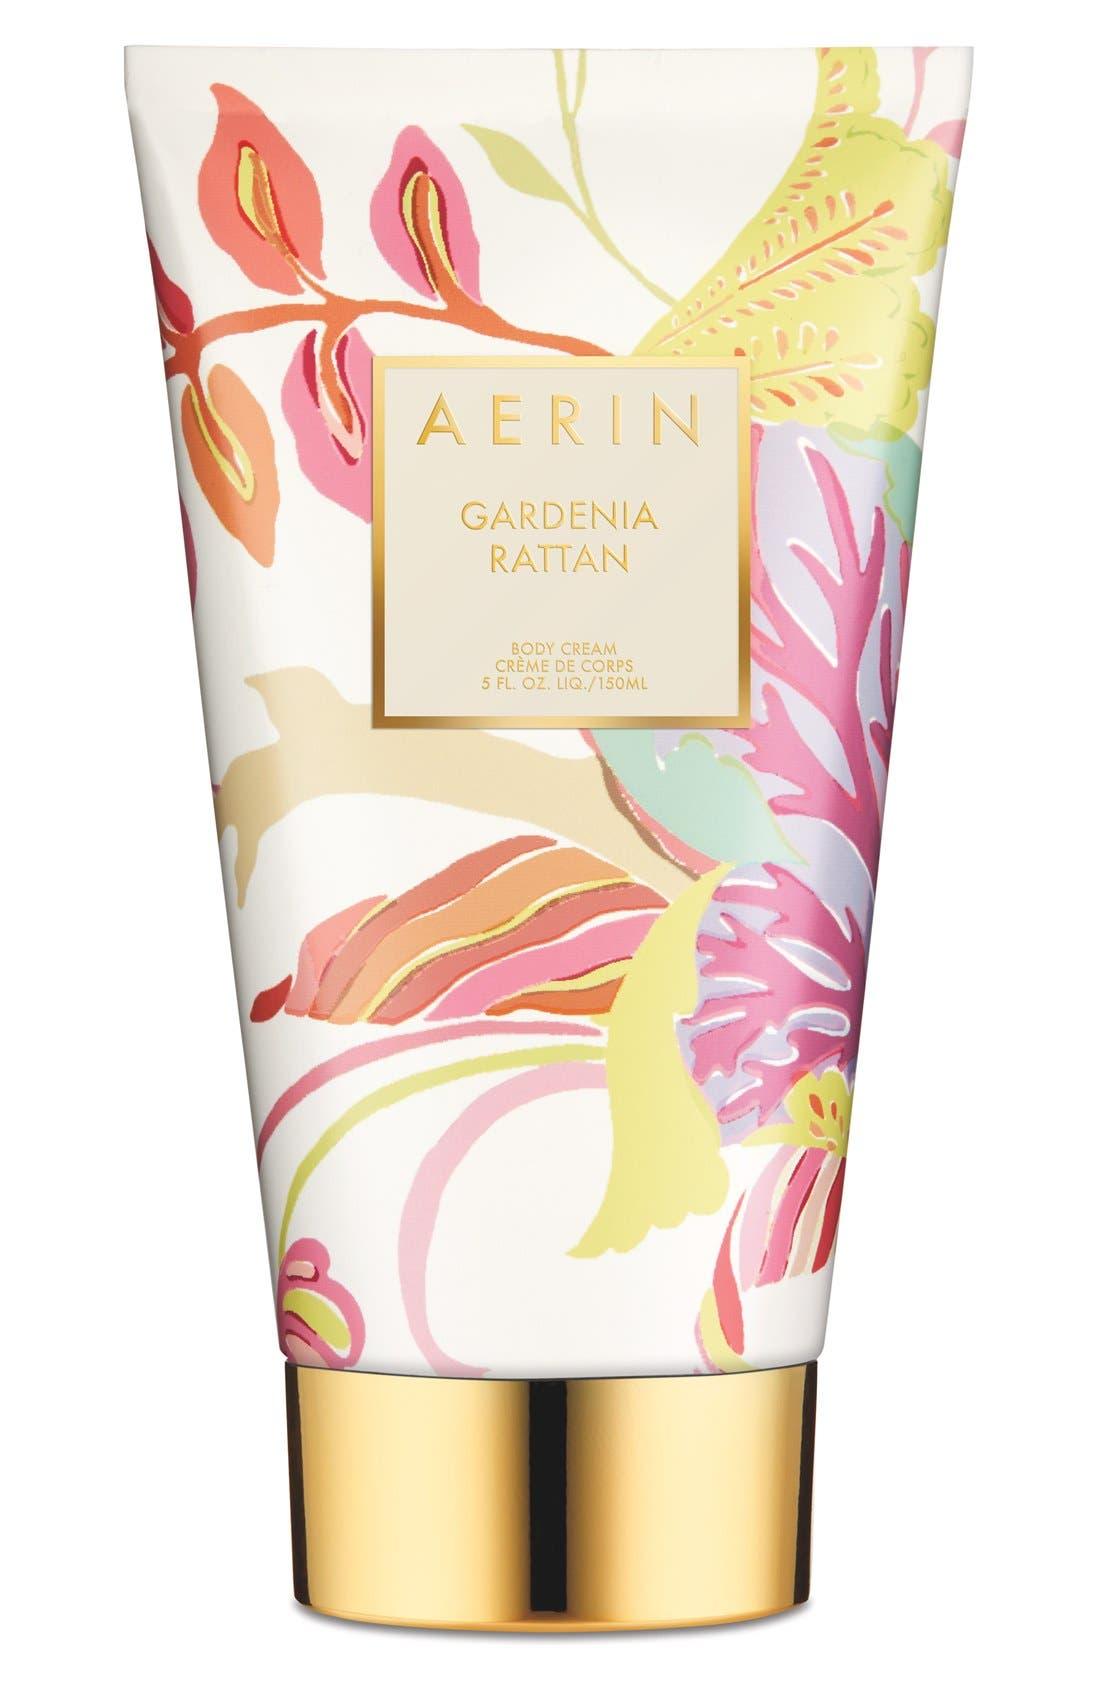 AERIN Beauty Gardenia Rattan Body Cream,                         Main,                         color, 000